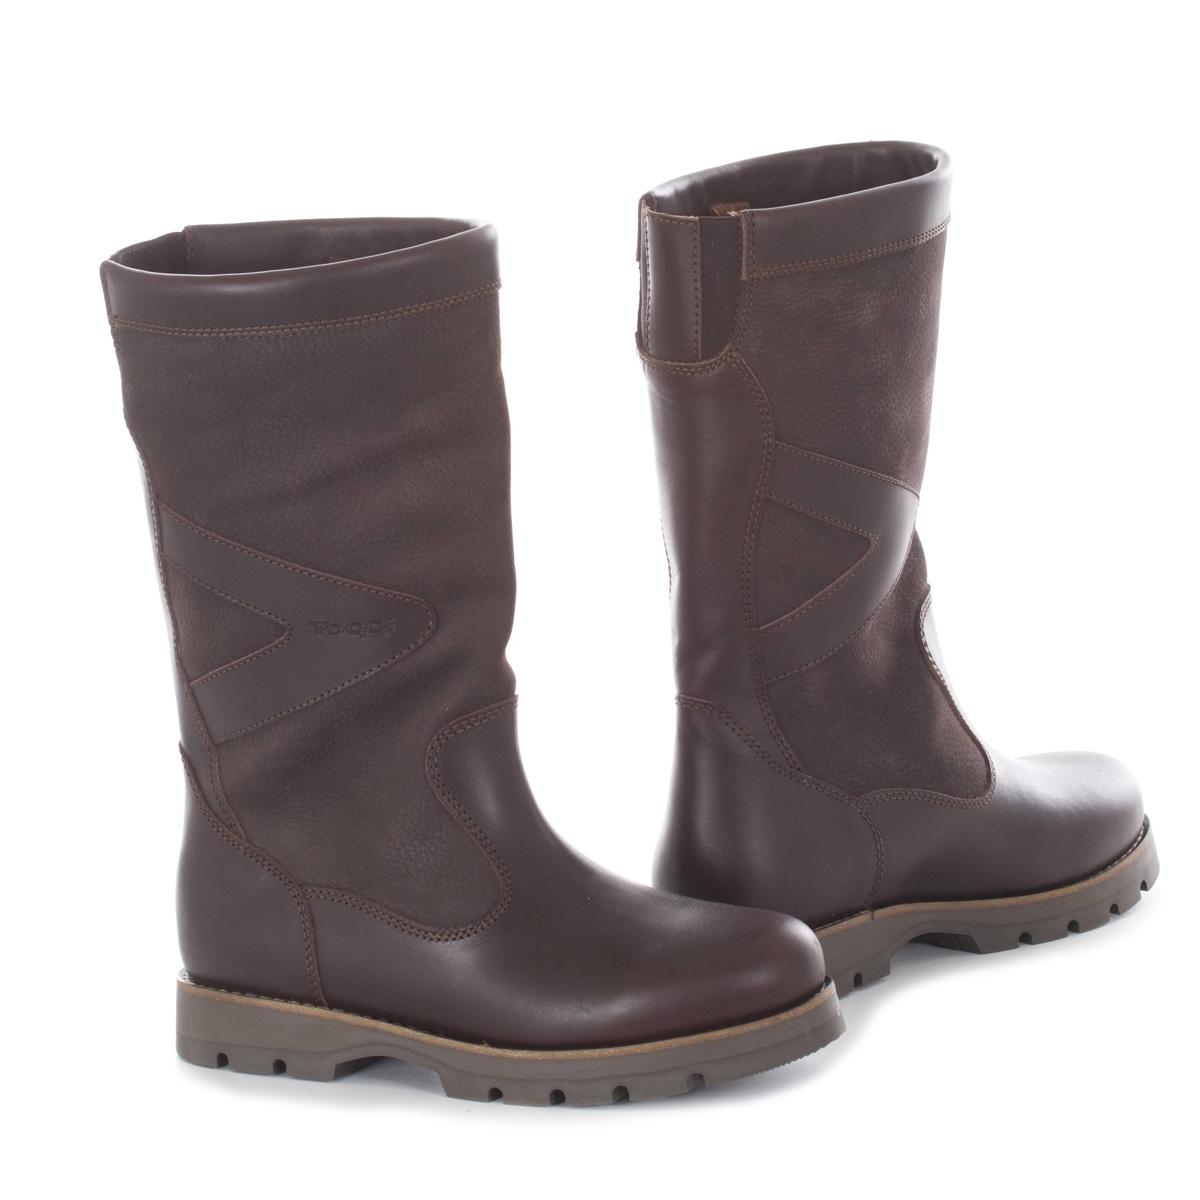 toggi boots image of toggi caledon waterproof country boots (unisex) - bitter chocolate futjjsz